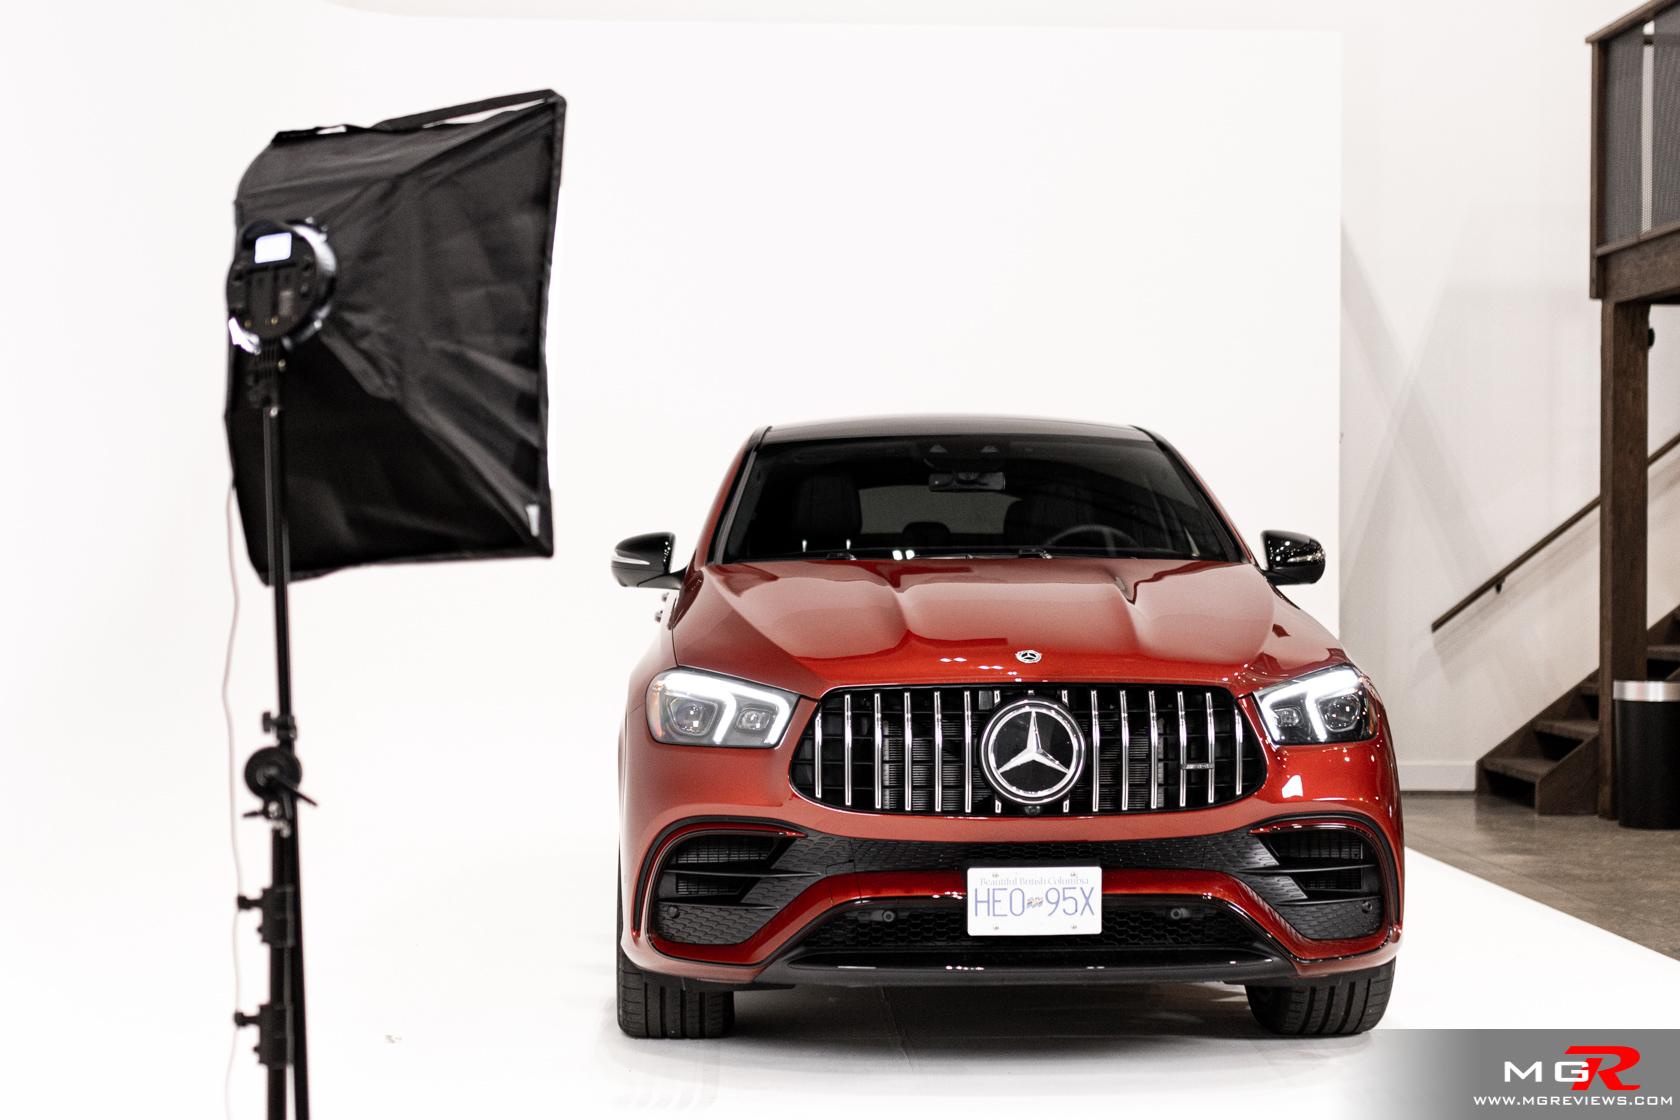 2021 Mercedes-Benz GLE 63S AMG